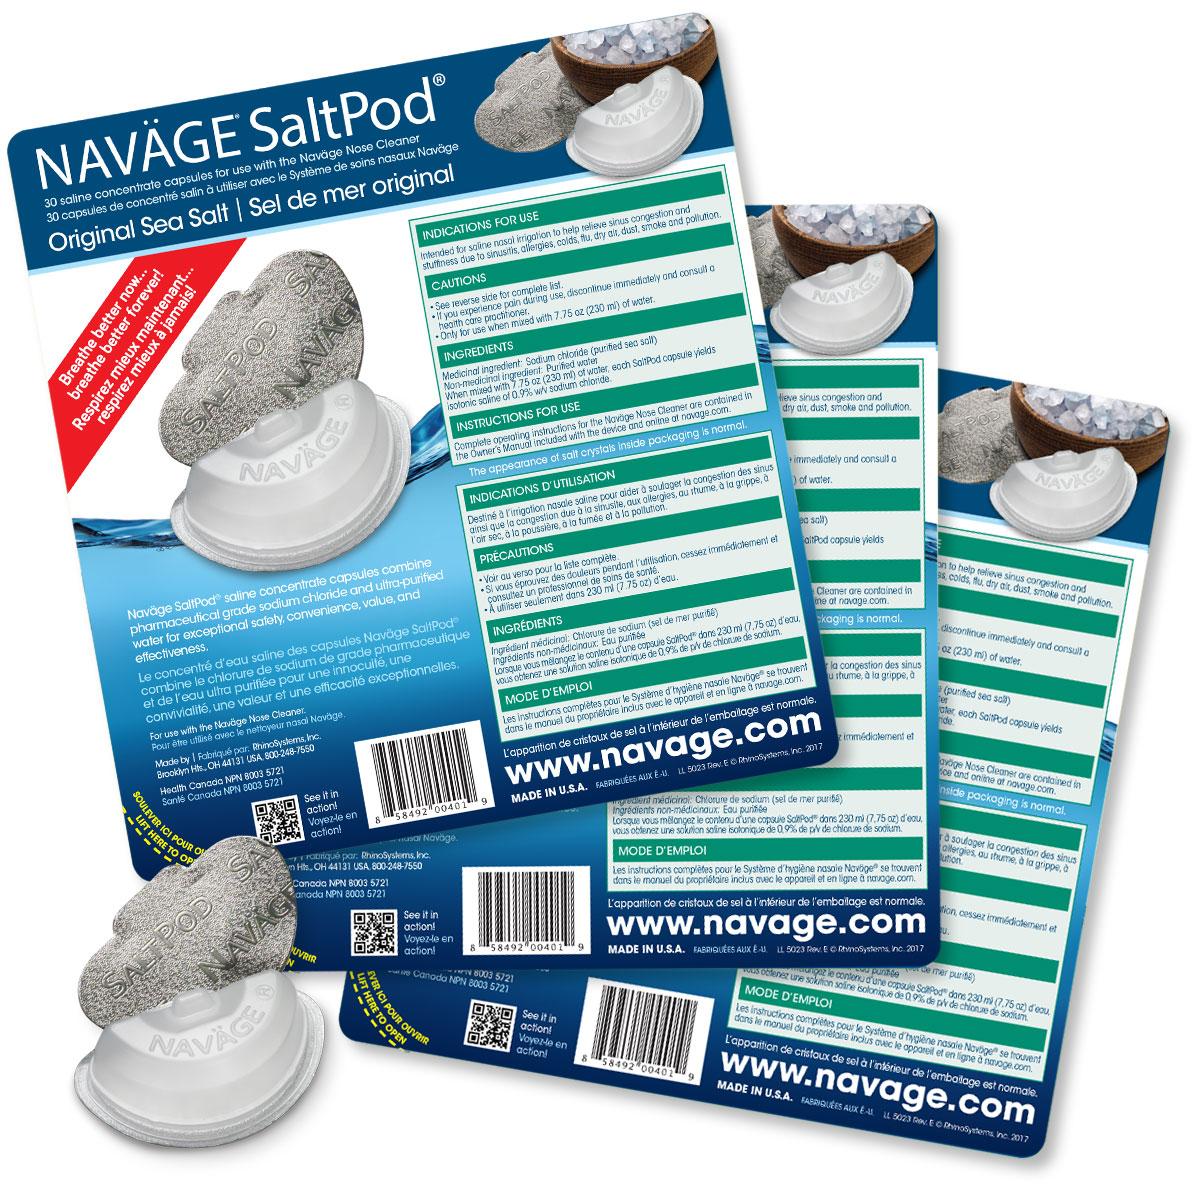 Navage SaltPod Bundle: 3 SaltPod 30-Packs (90 SaltPods) $44.85 if purchased separately